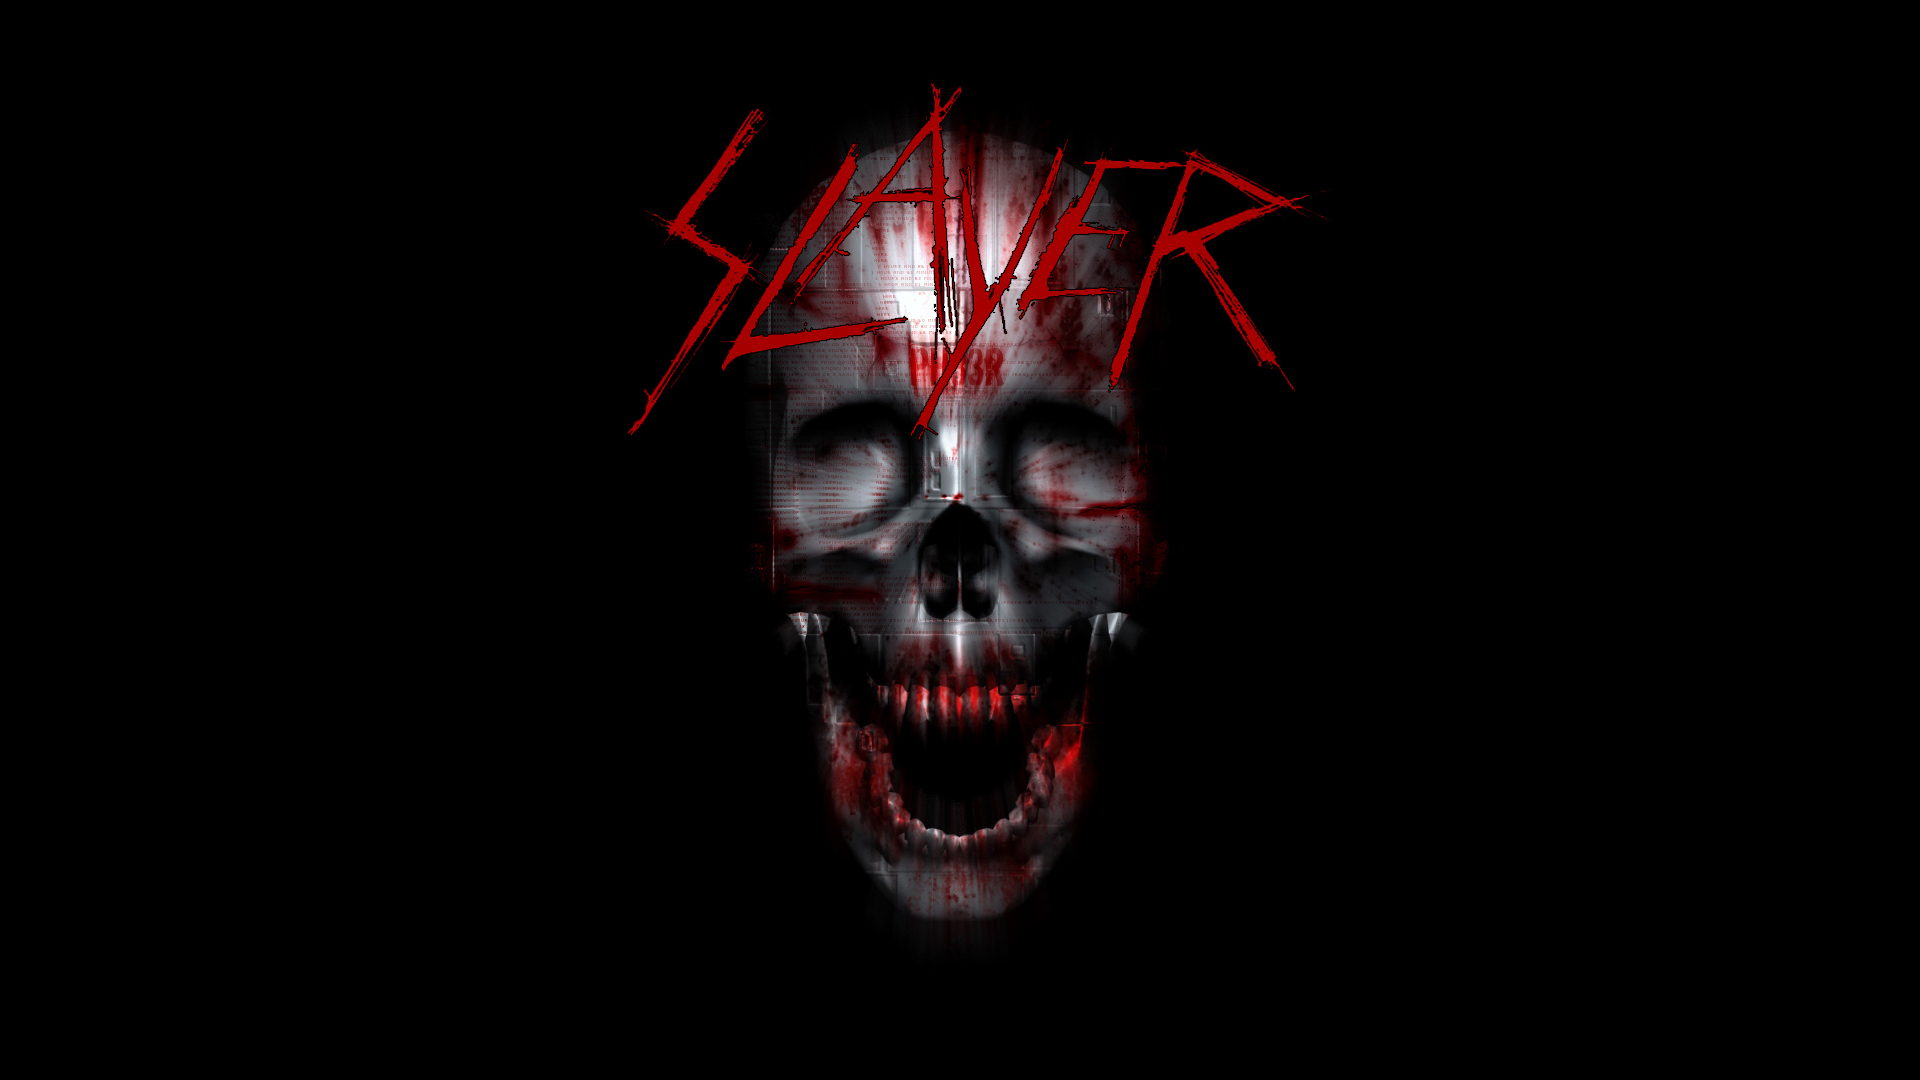 Slayer Computer Wallpapers Desktop Backgrounds 1920x1080 ID 1920x1080